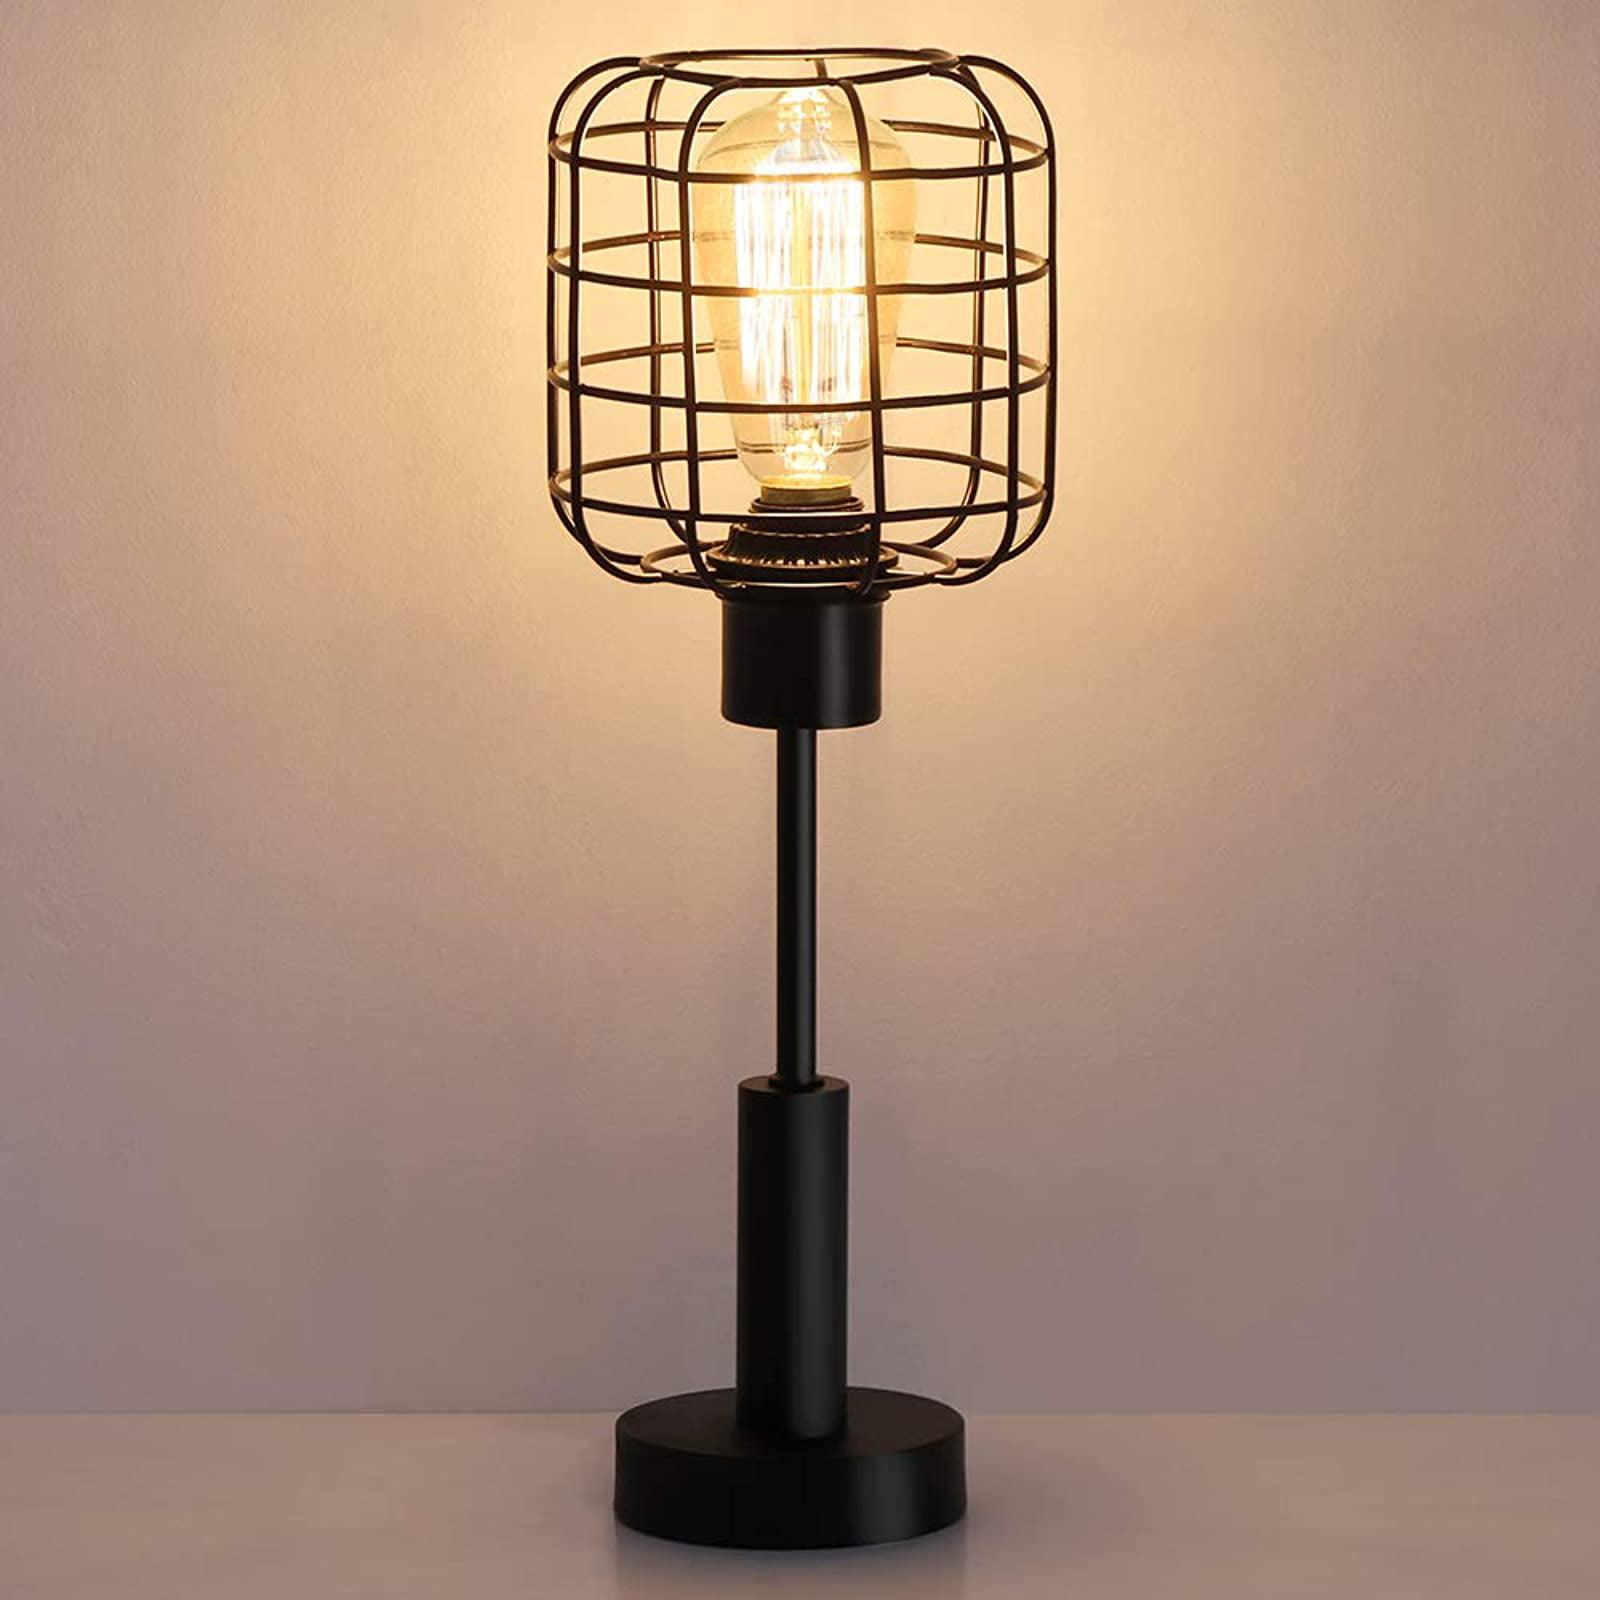 Haitral Modern Table Lamp Edison Vintage Nightstand Lamp For Bedroom Office Dorm Living Room Black Walmart Com Walmart Com